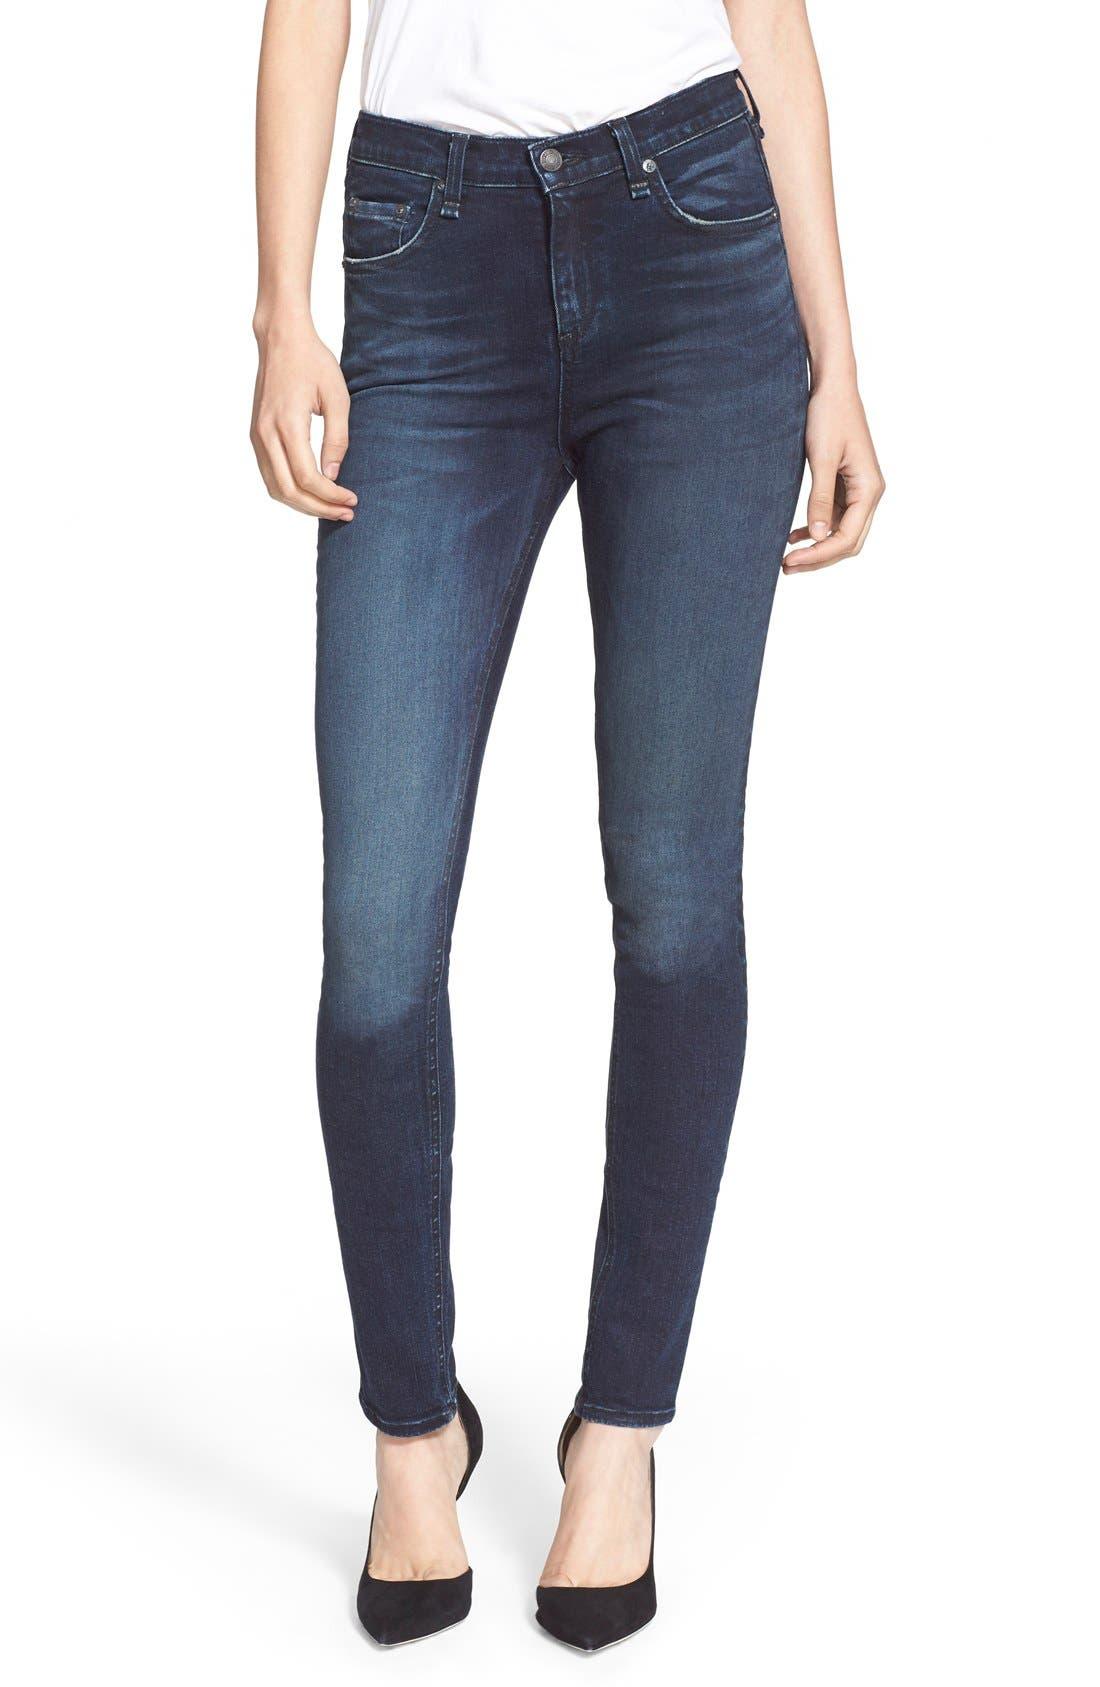 Main Image - rag & bone/JEAN High Rise Skinny Jeans (St Germain)